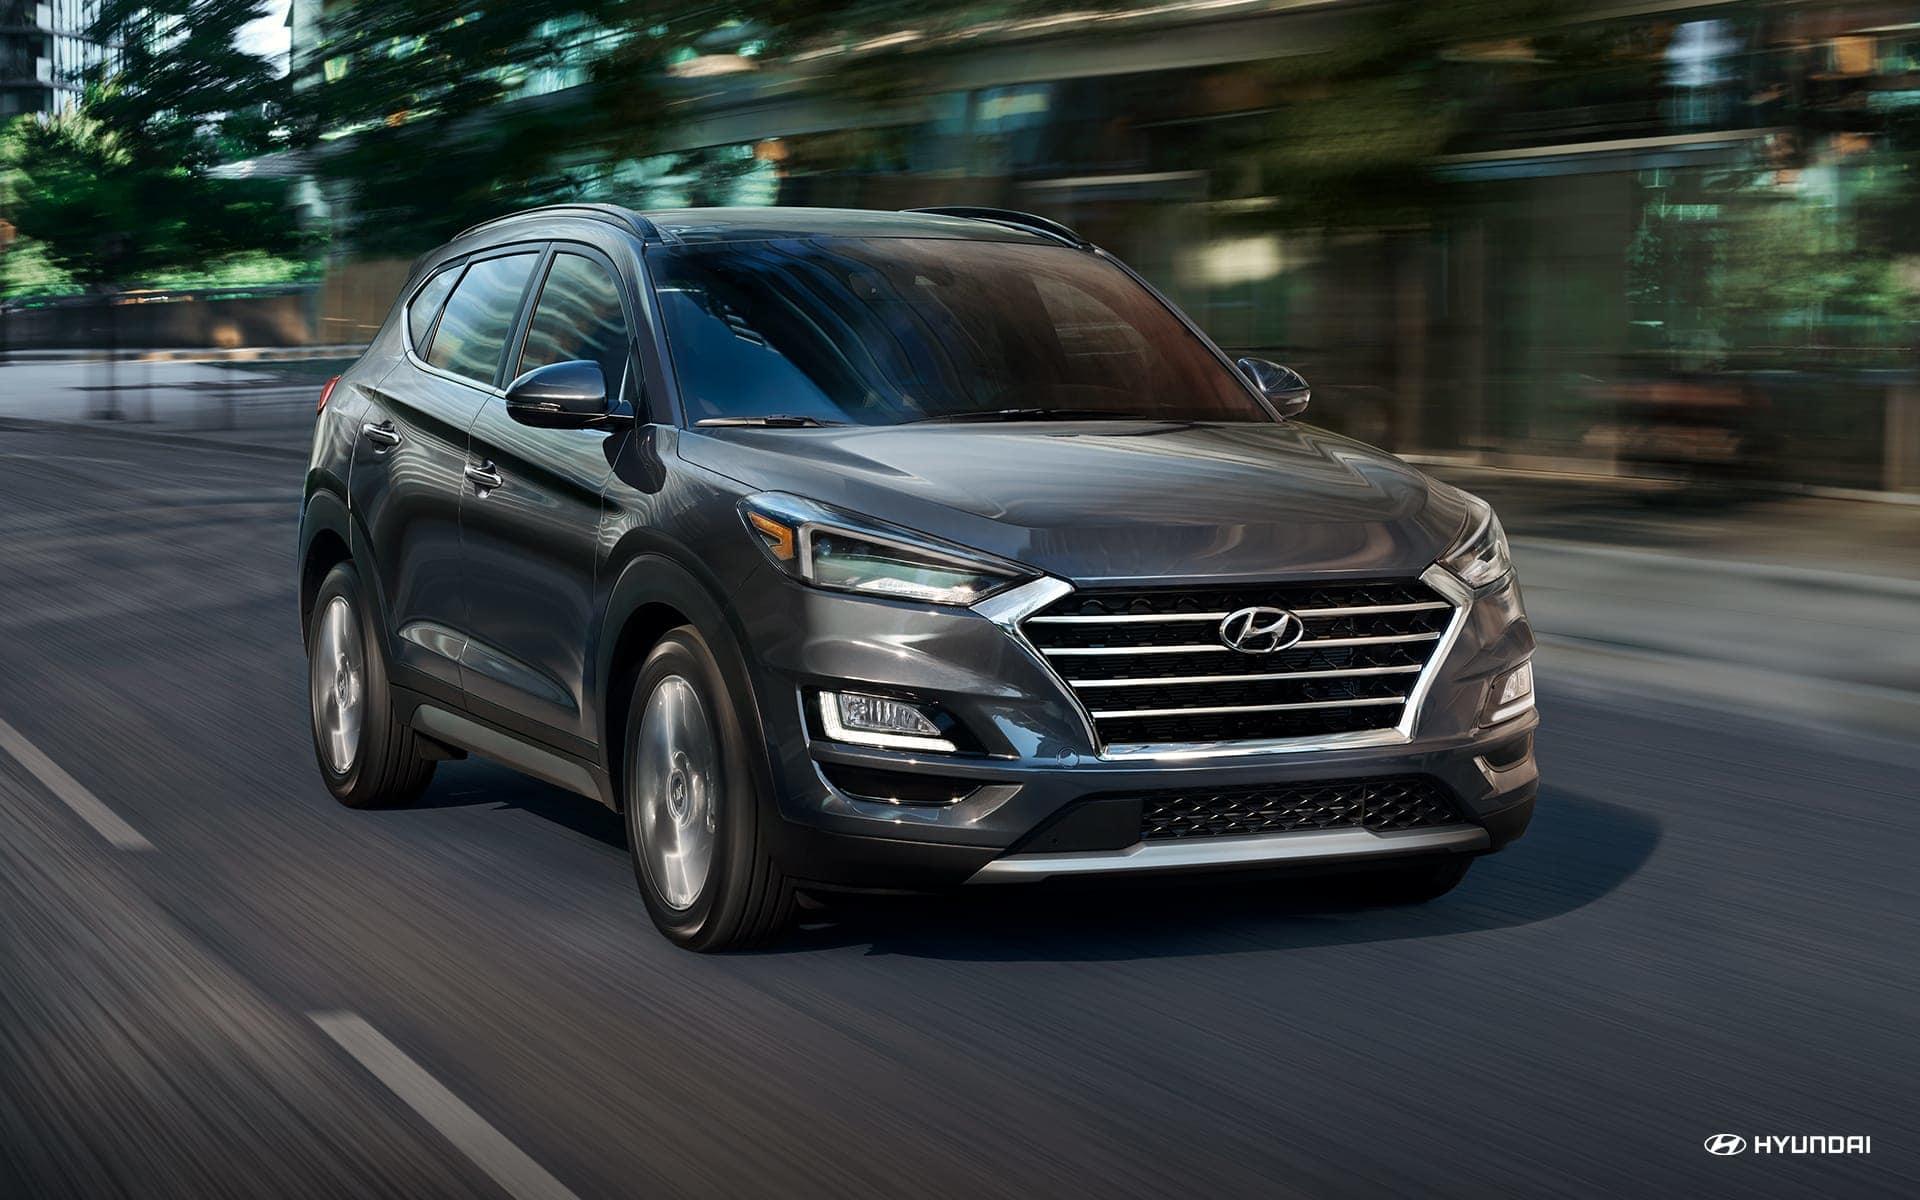 2019 Hyundai Tucson Leasing near Washington, DC